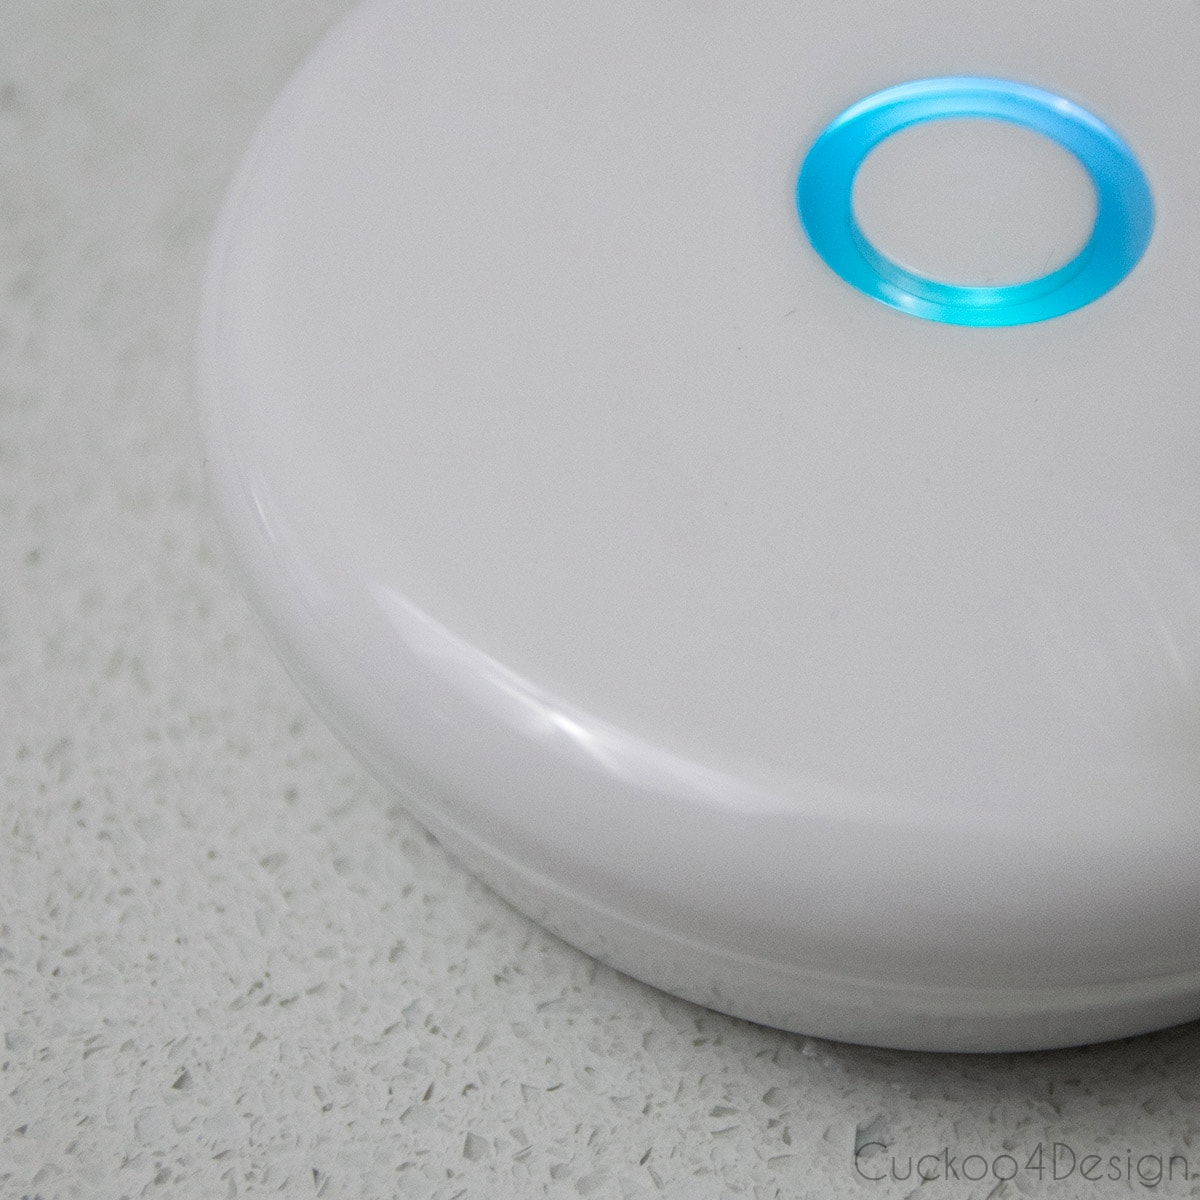 water leak sensor with blue alert light and beep